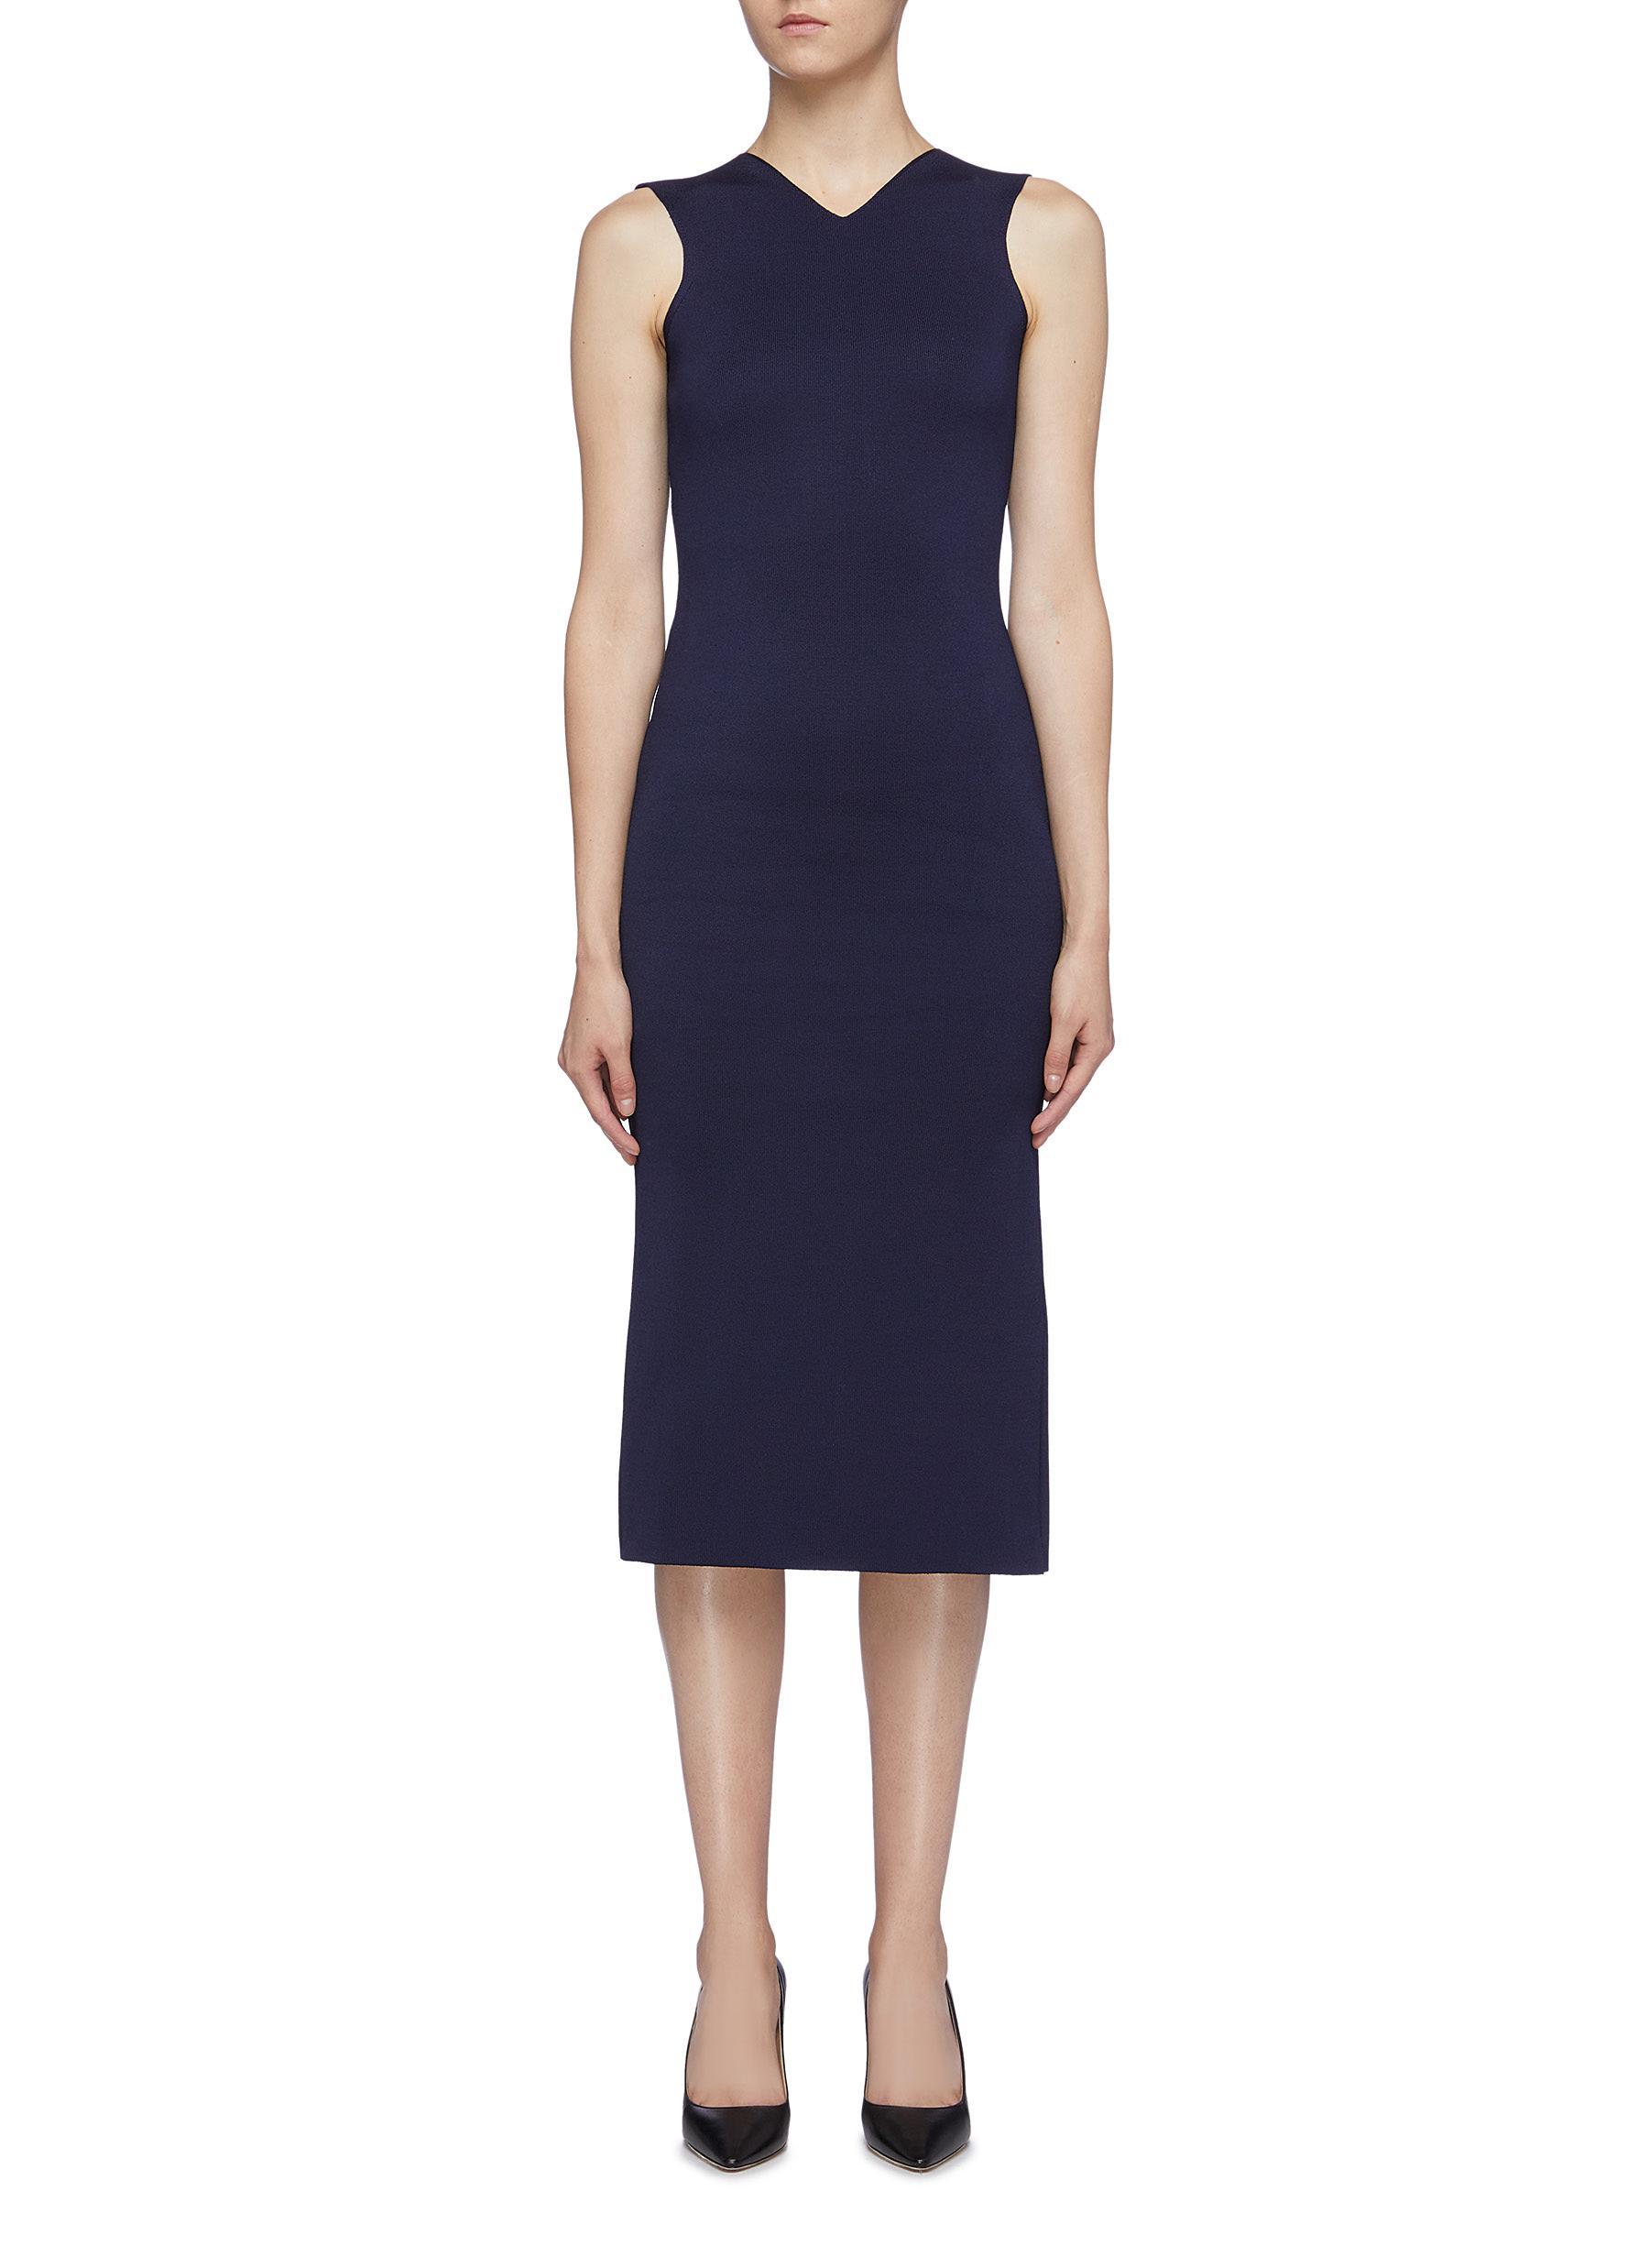 Colourblock panel sleeveless knit dress by Victoria Beckham